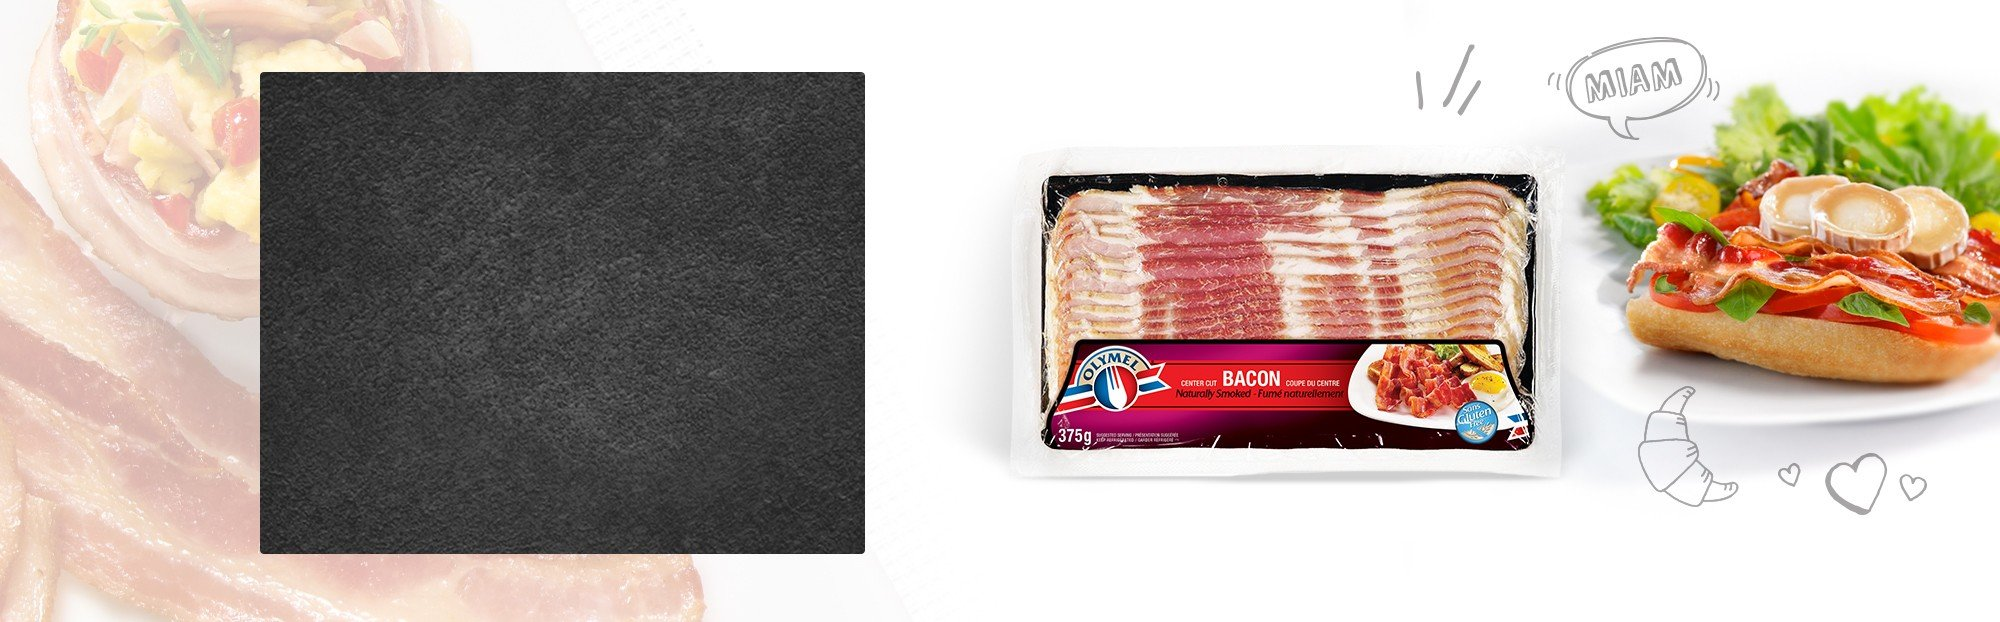 Naturally Smoked Bacon